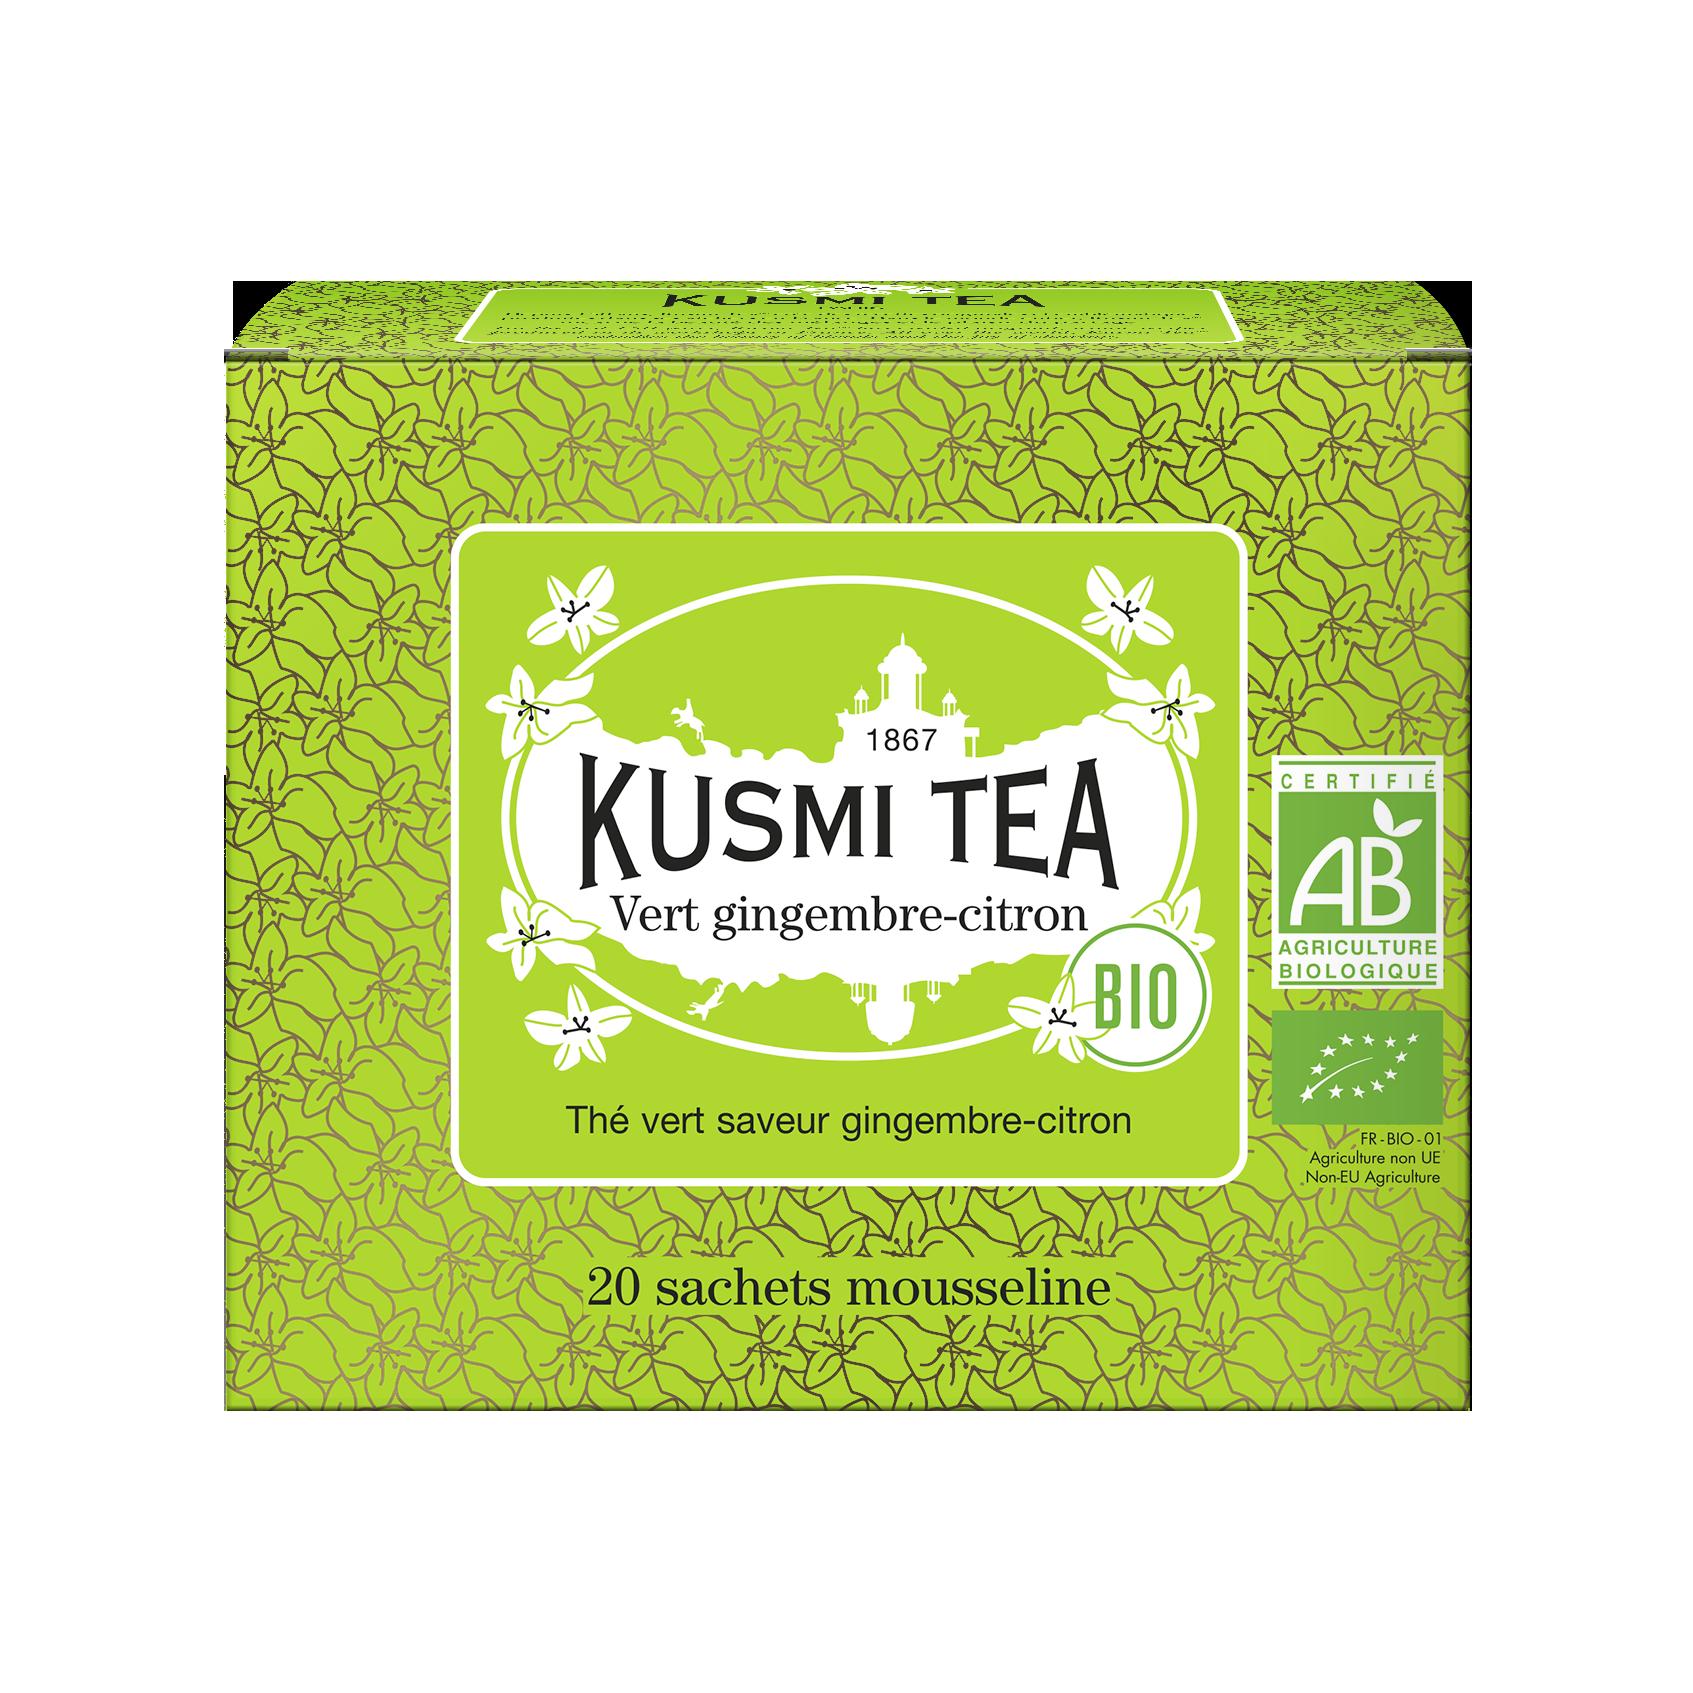 Thé vert Sachet - Vert gingembre-citron Bio - Kusmi Tea